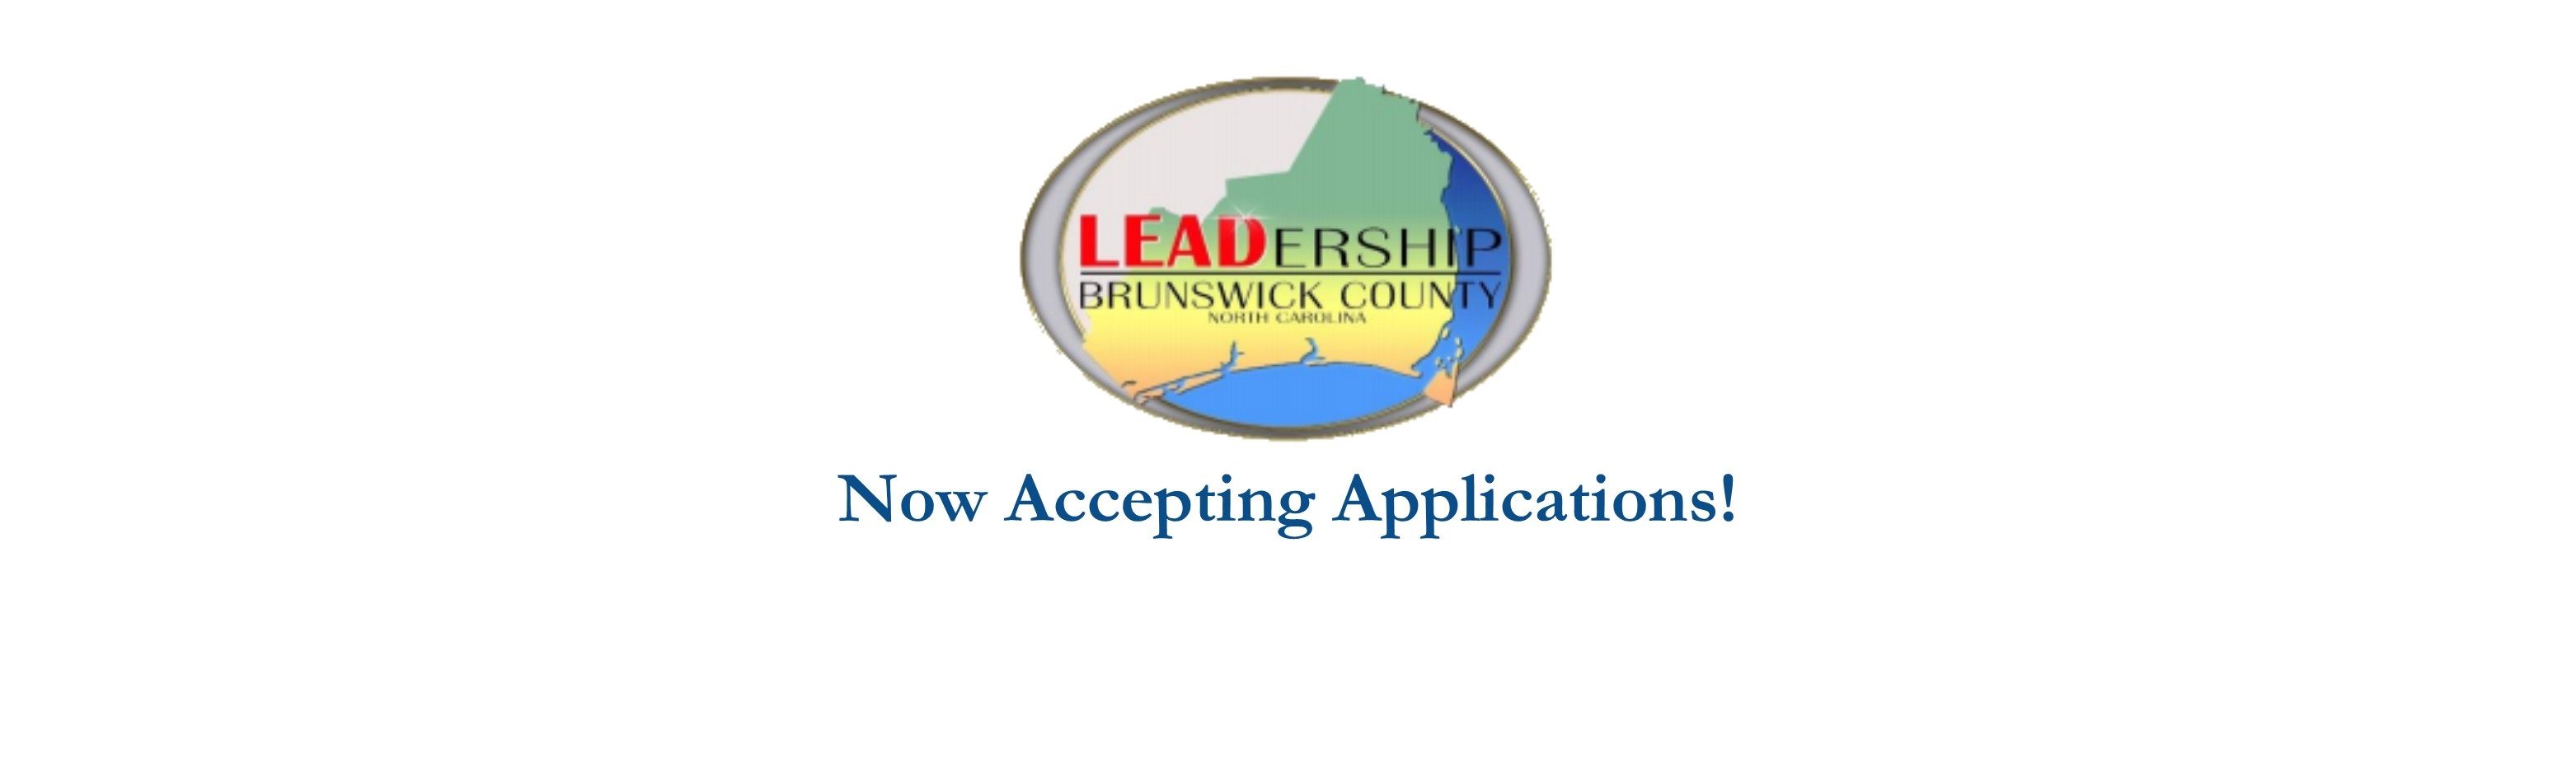 Leadership Brunswick County